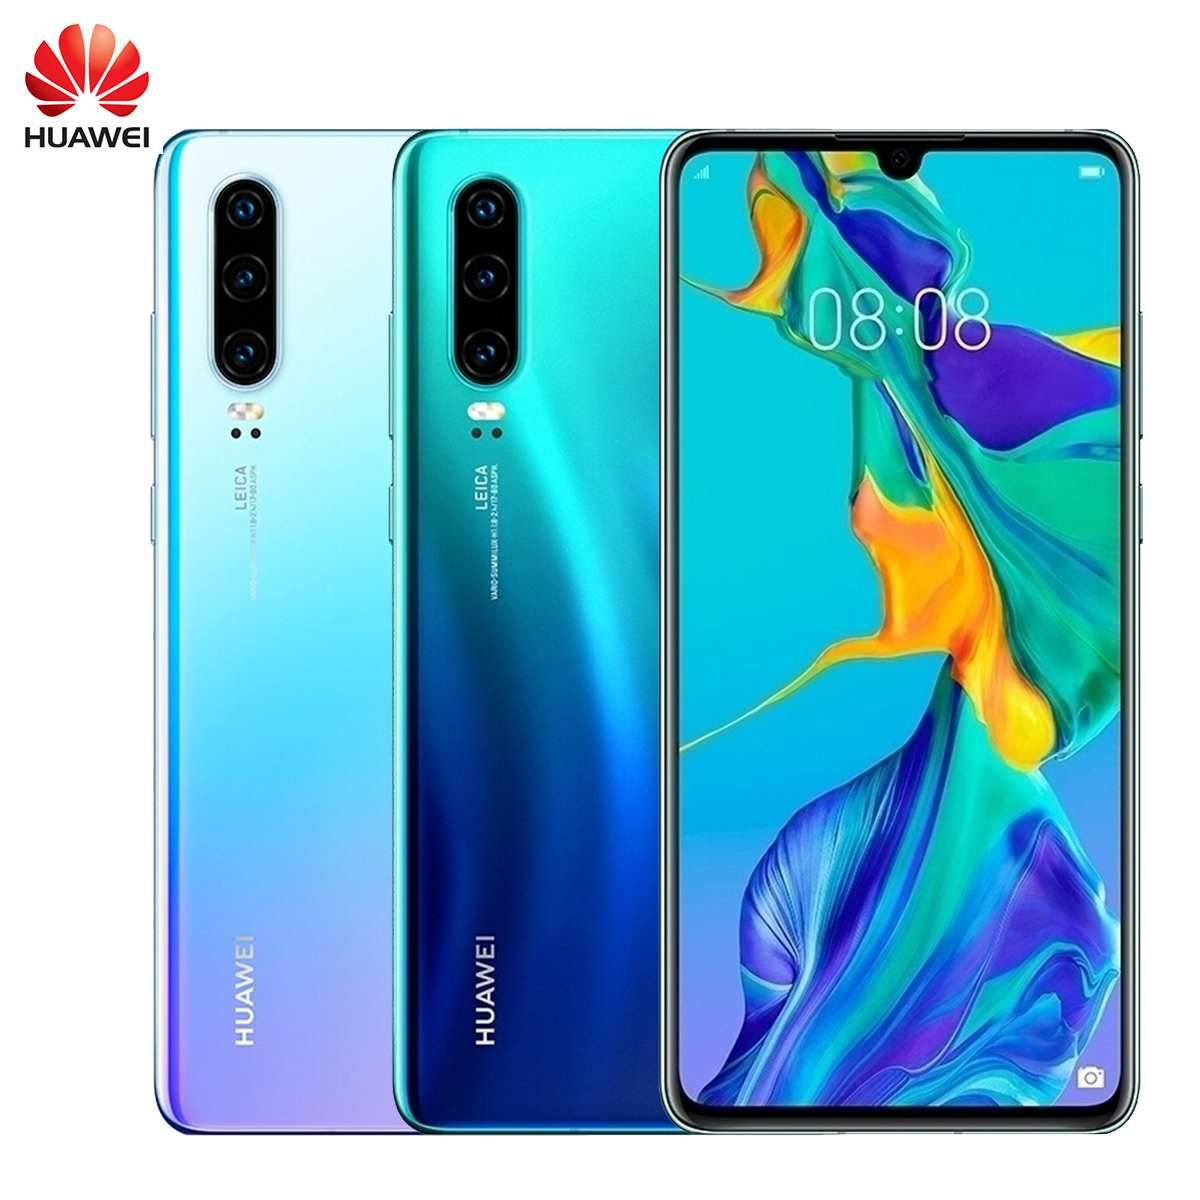 Original HUAWEI P30 128GB + 8GB Smartphone 6,1 zoll Kirin 980 Octa Core Handy Android 9.0 Dual SIM karte 3650mAh 4 Kameras